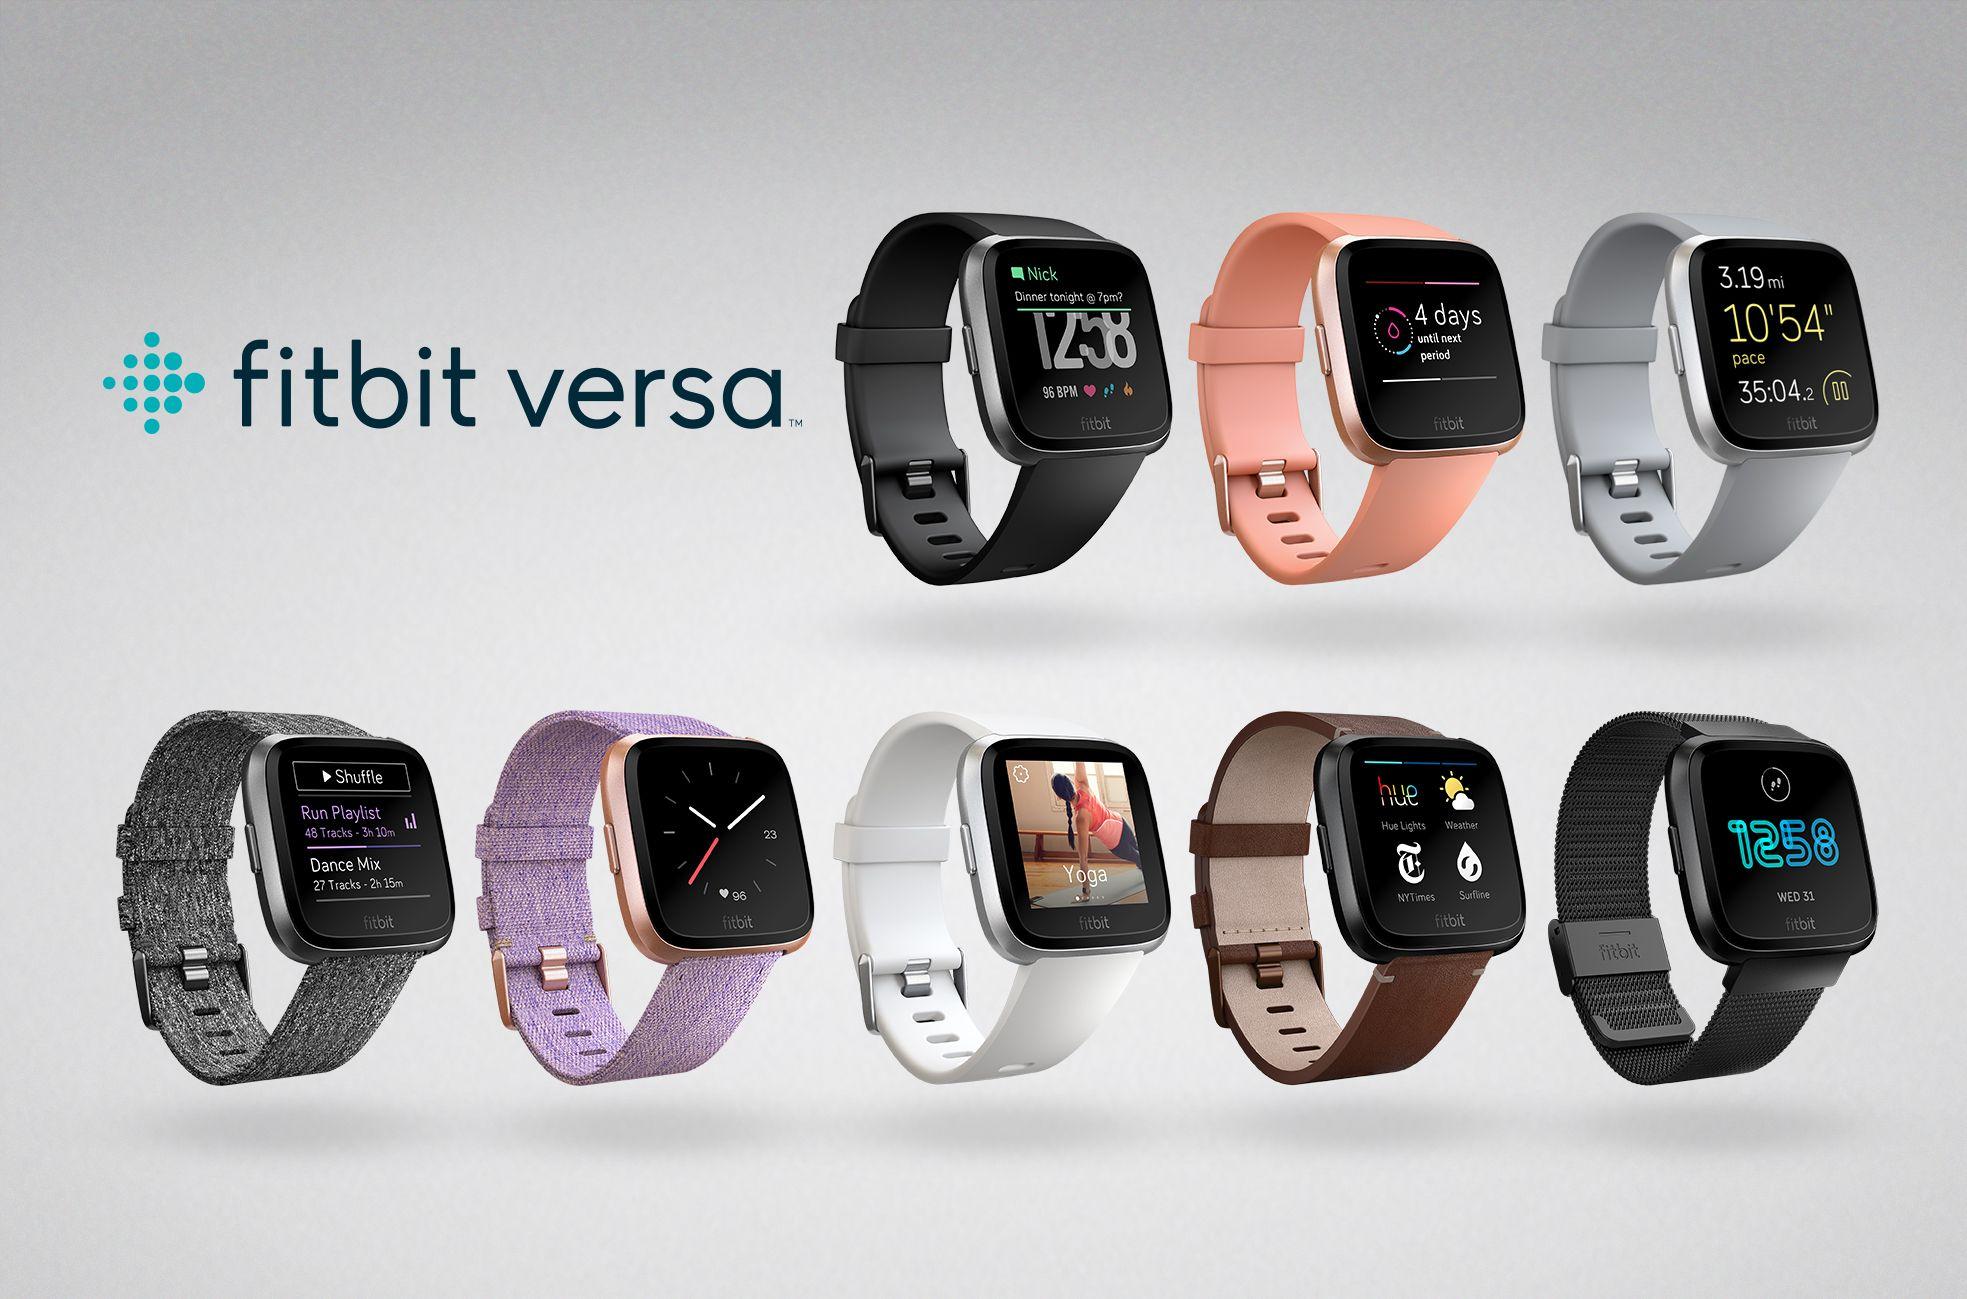 2f9c9d77042f91511c361d542de23c54 - How To Get Free Music On Fitbit Versa 2